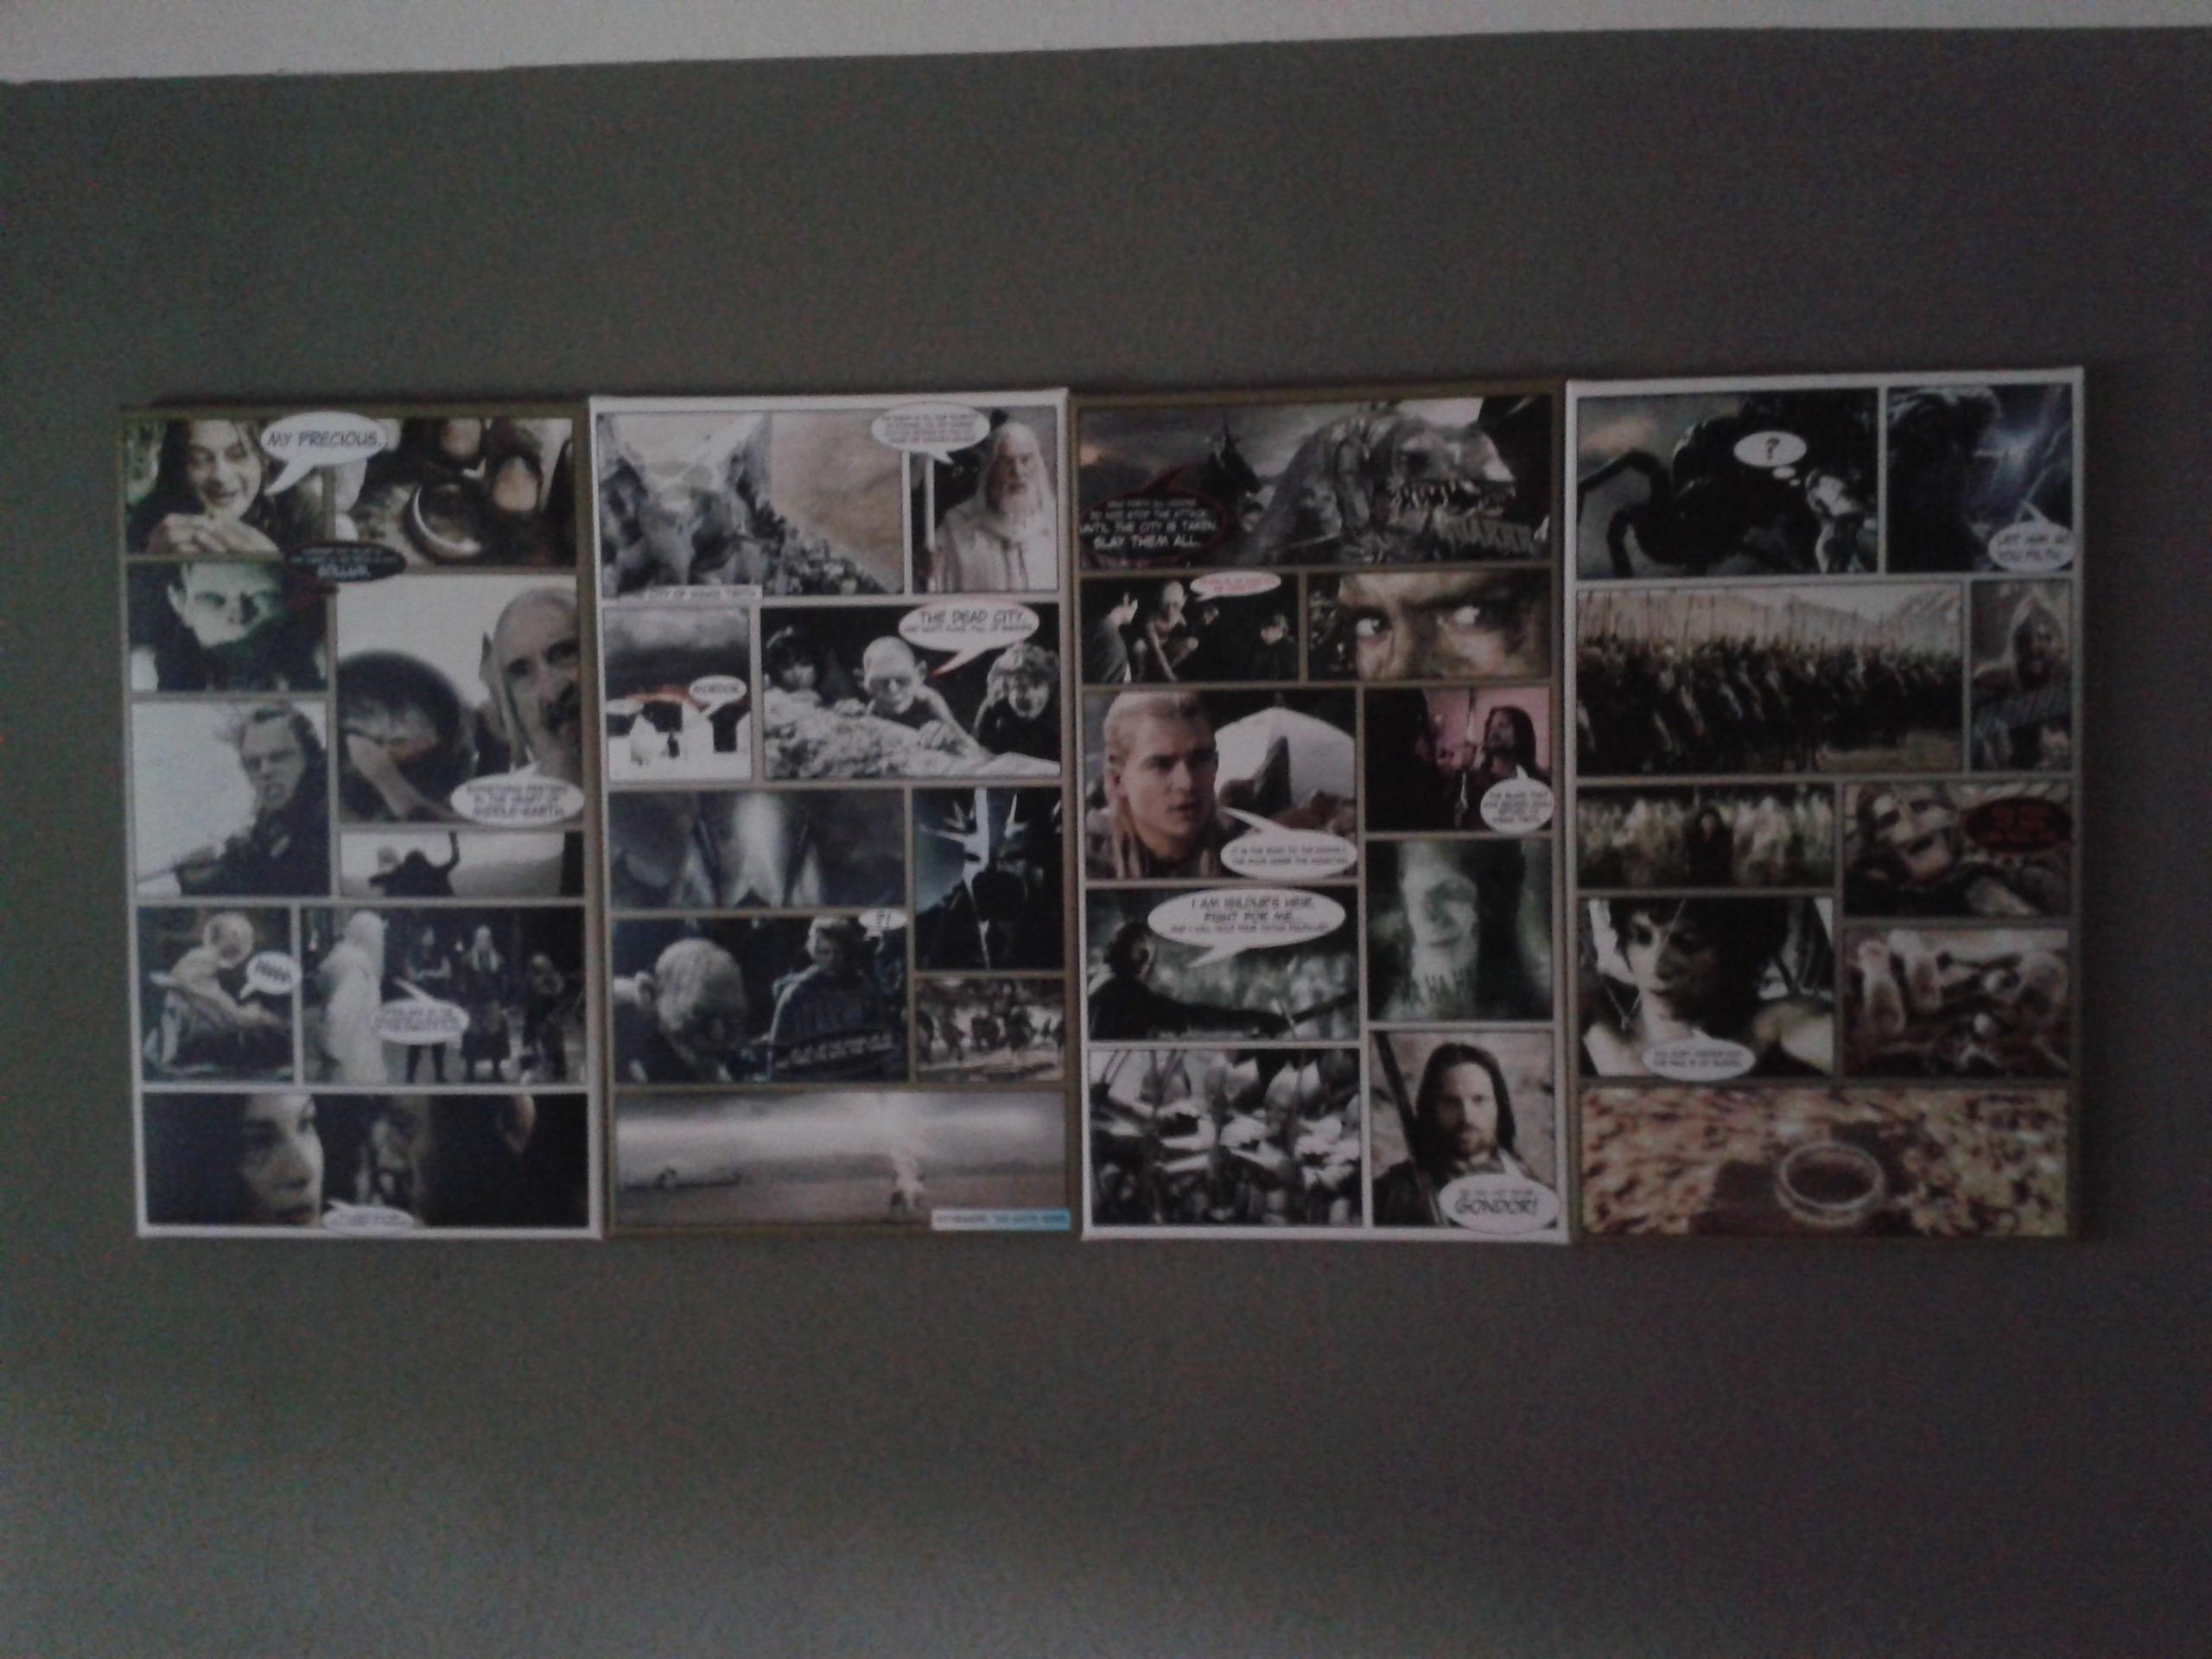 das wandbild herr der ringe iii 160x70cm wandbilder xxl. Black Bedroom Furniture Sets. Home Design Ideas